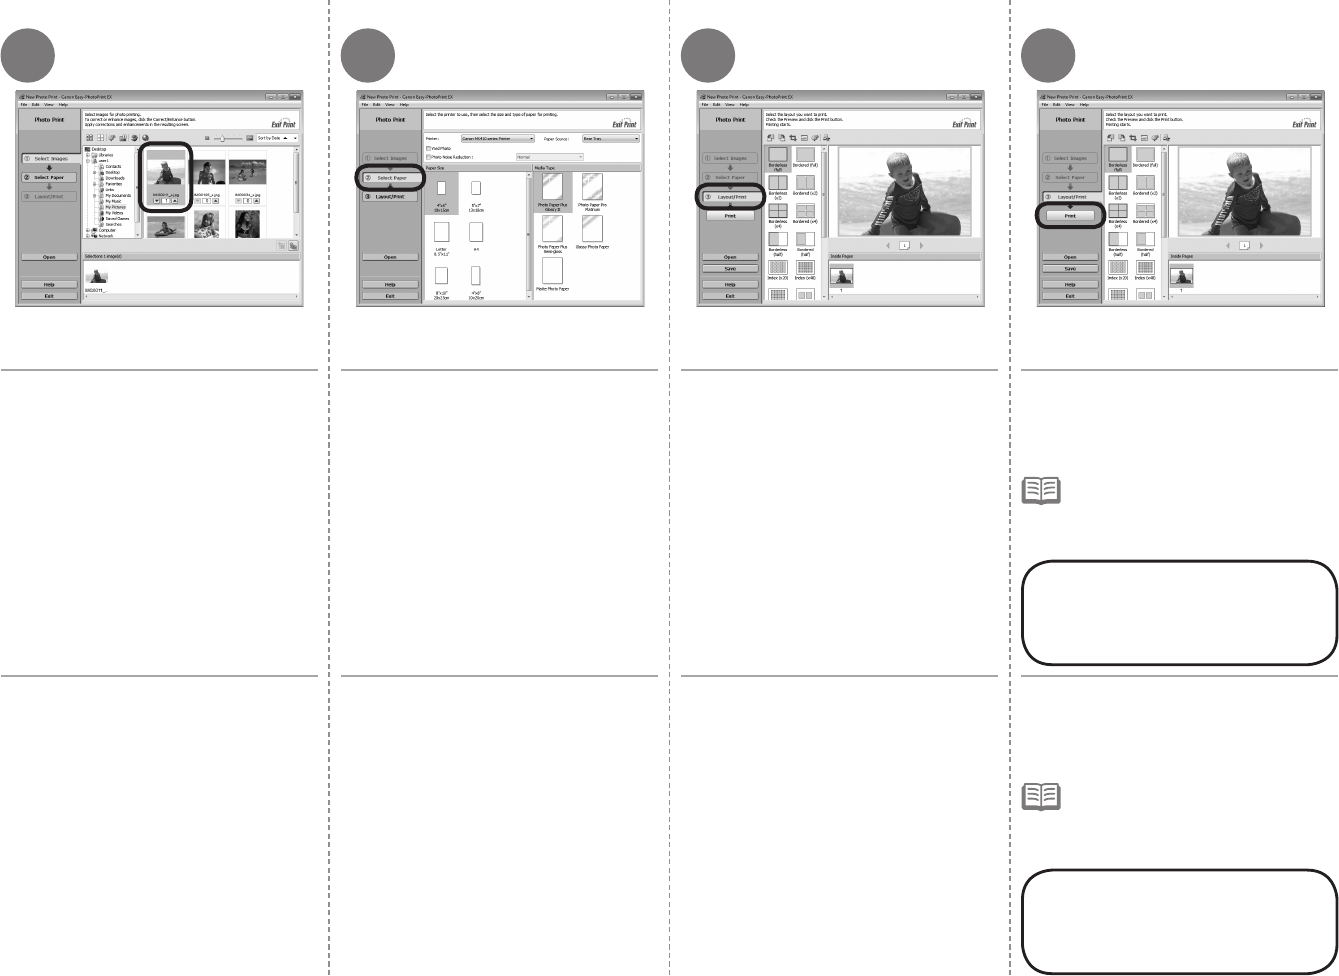 Canon Pixma Mx410 Multifunction Printer 4788B018 Users Manual